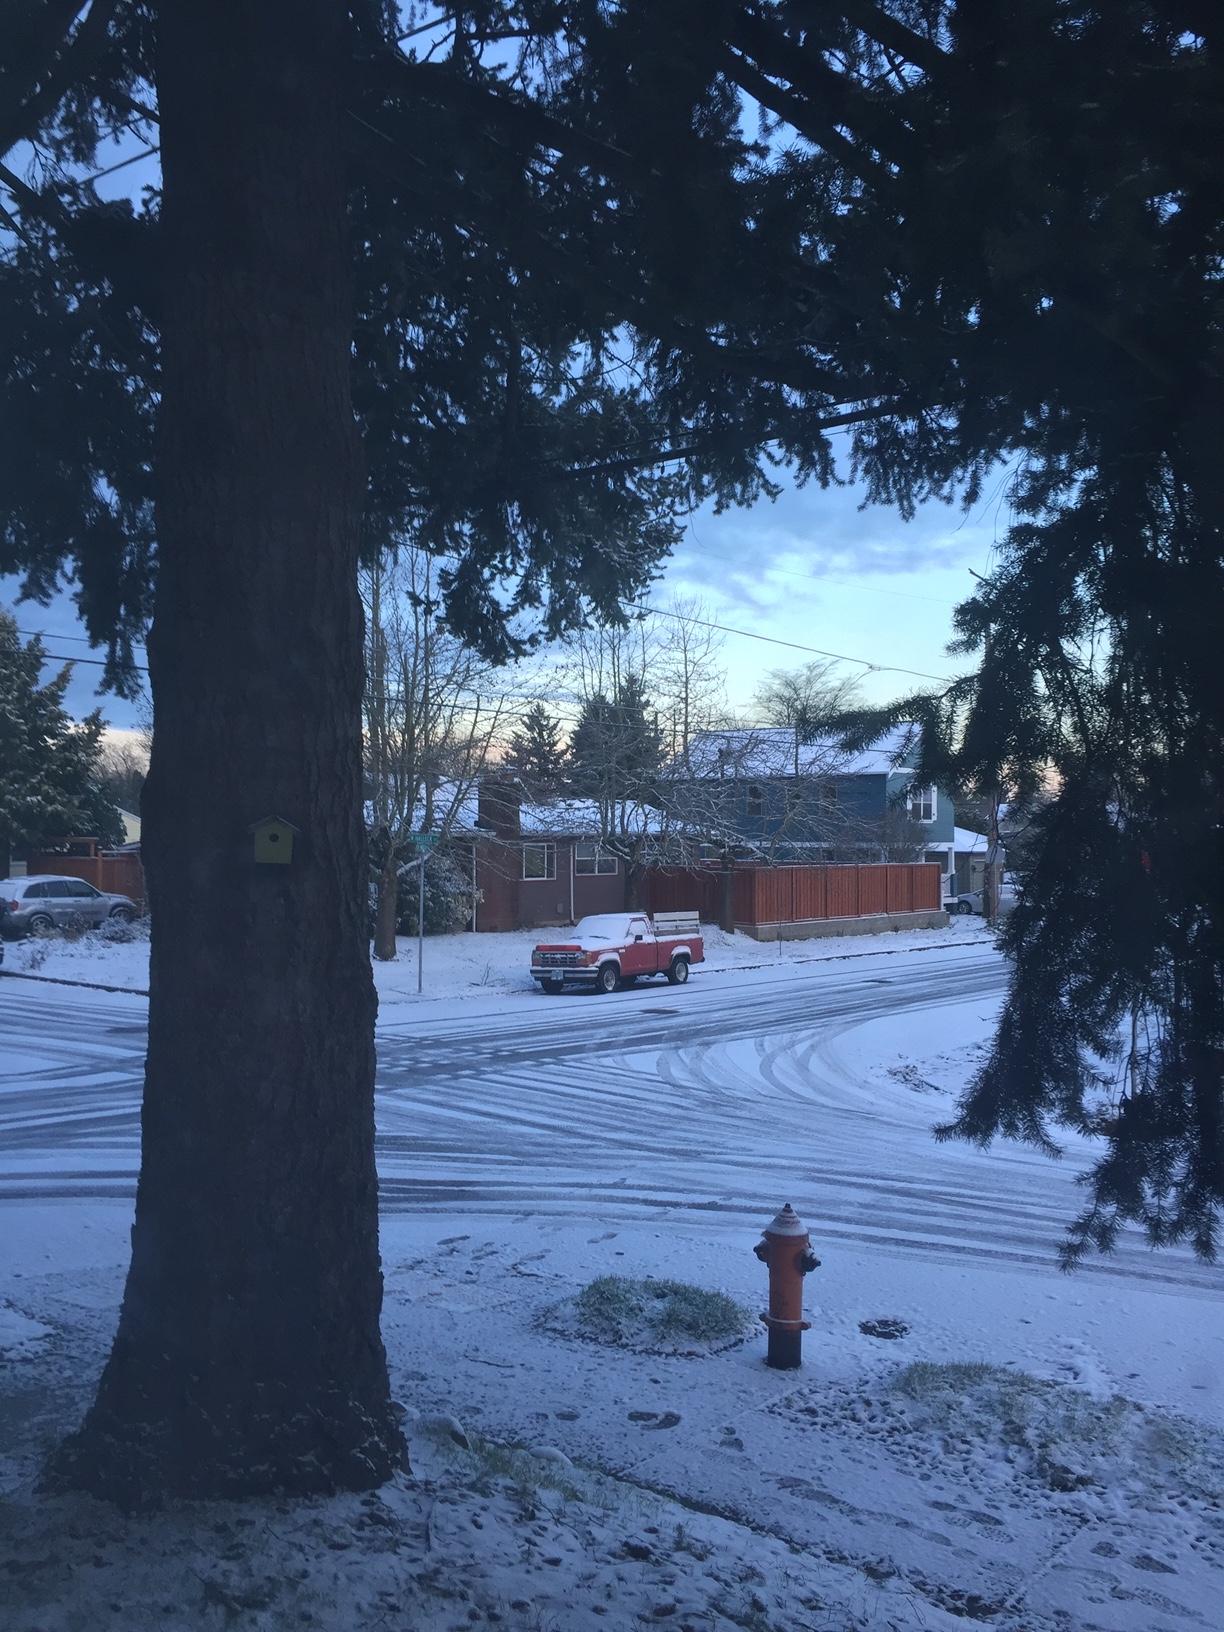 A Snowy Portland Street